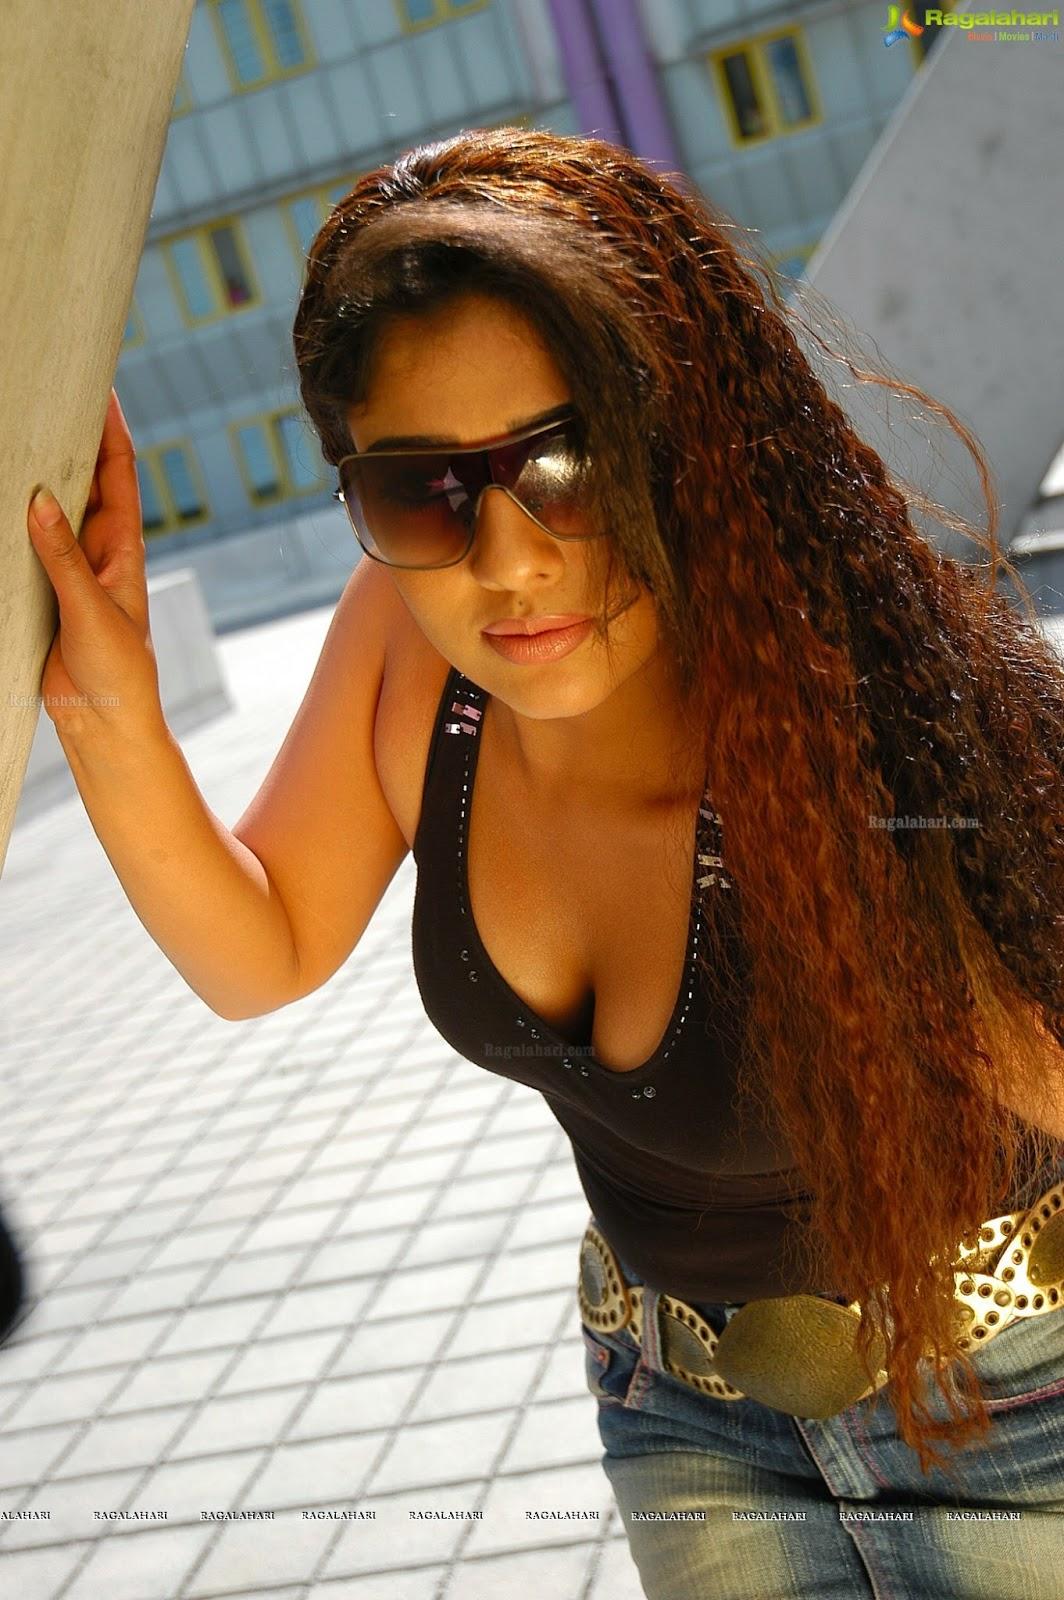 Nayanthara Hot In Black Bra Hd Images - Glamex-8478